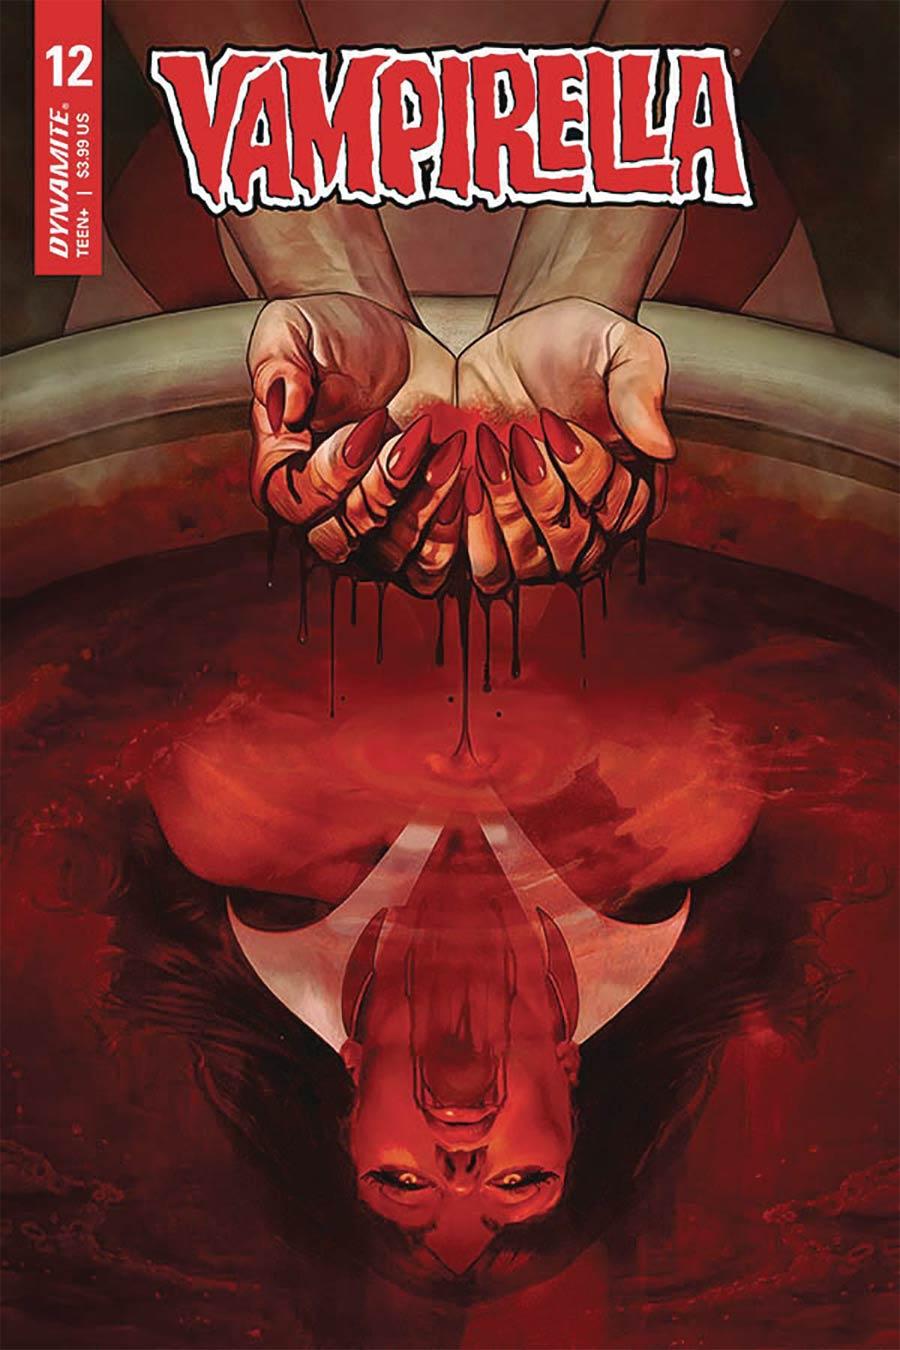 Vampirella Vol 8 #12 Cover C Variant Fay Dalton Cover